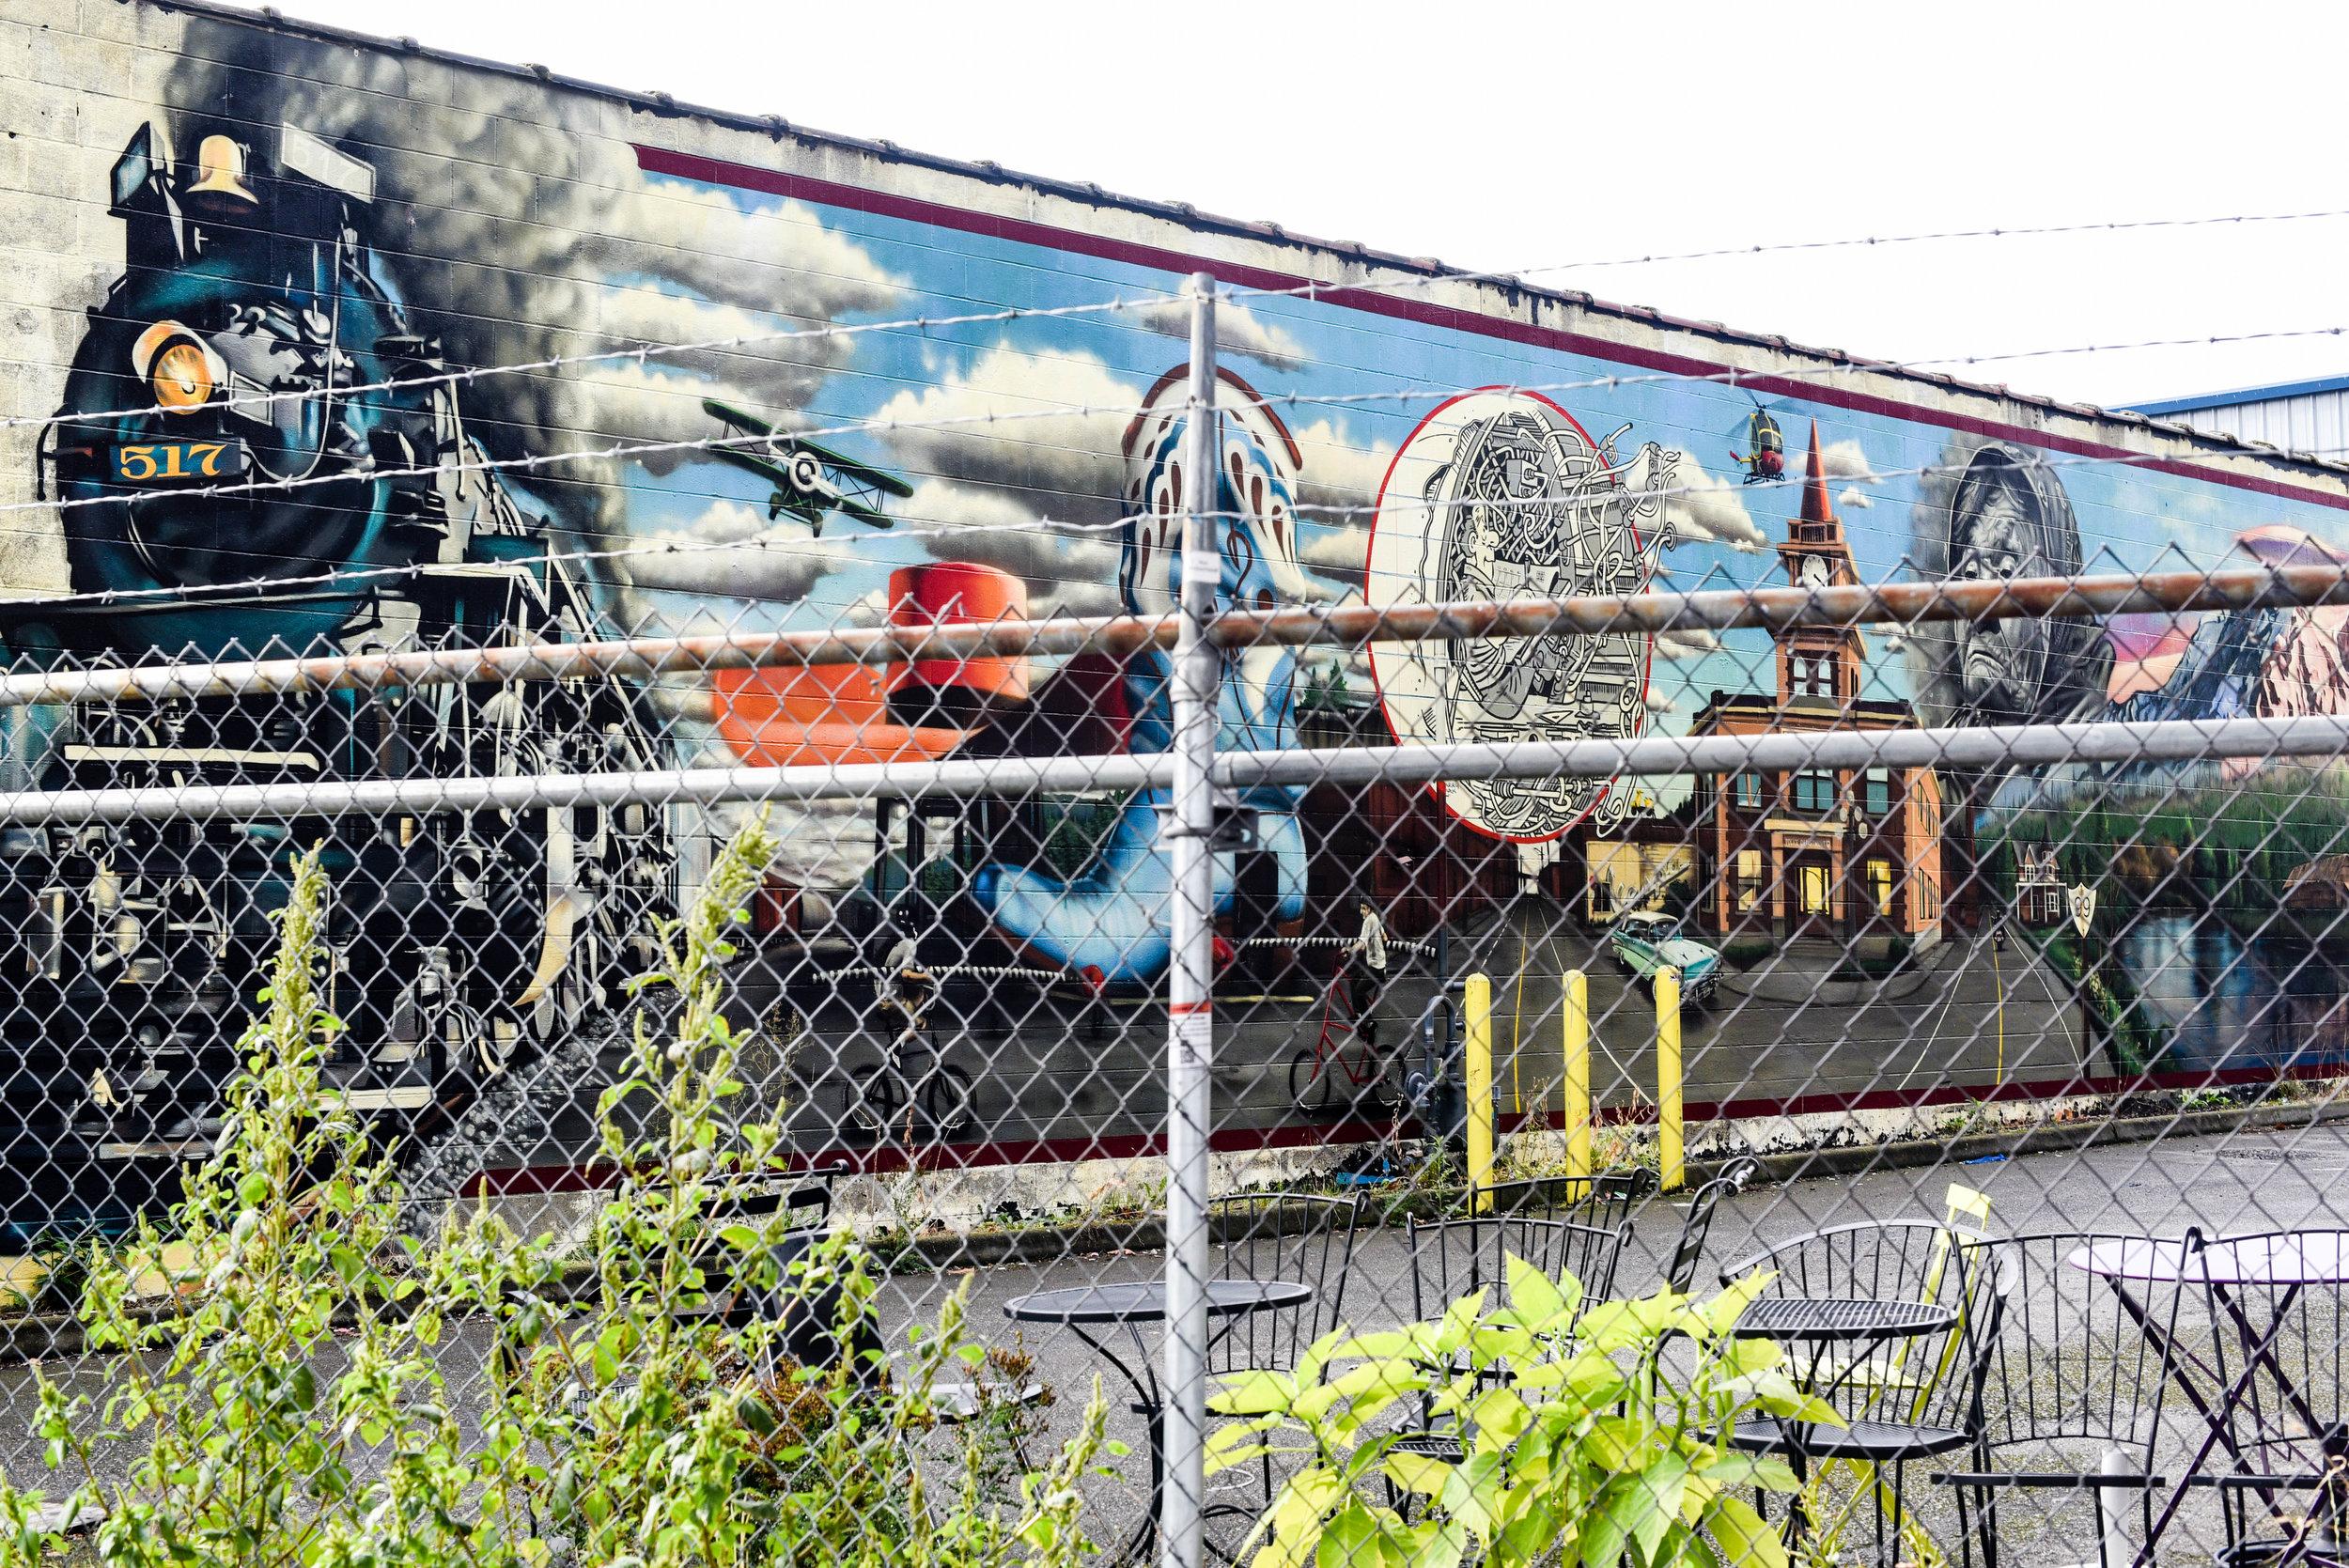 cool mural - brass tacks